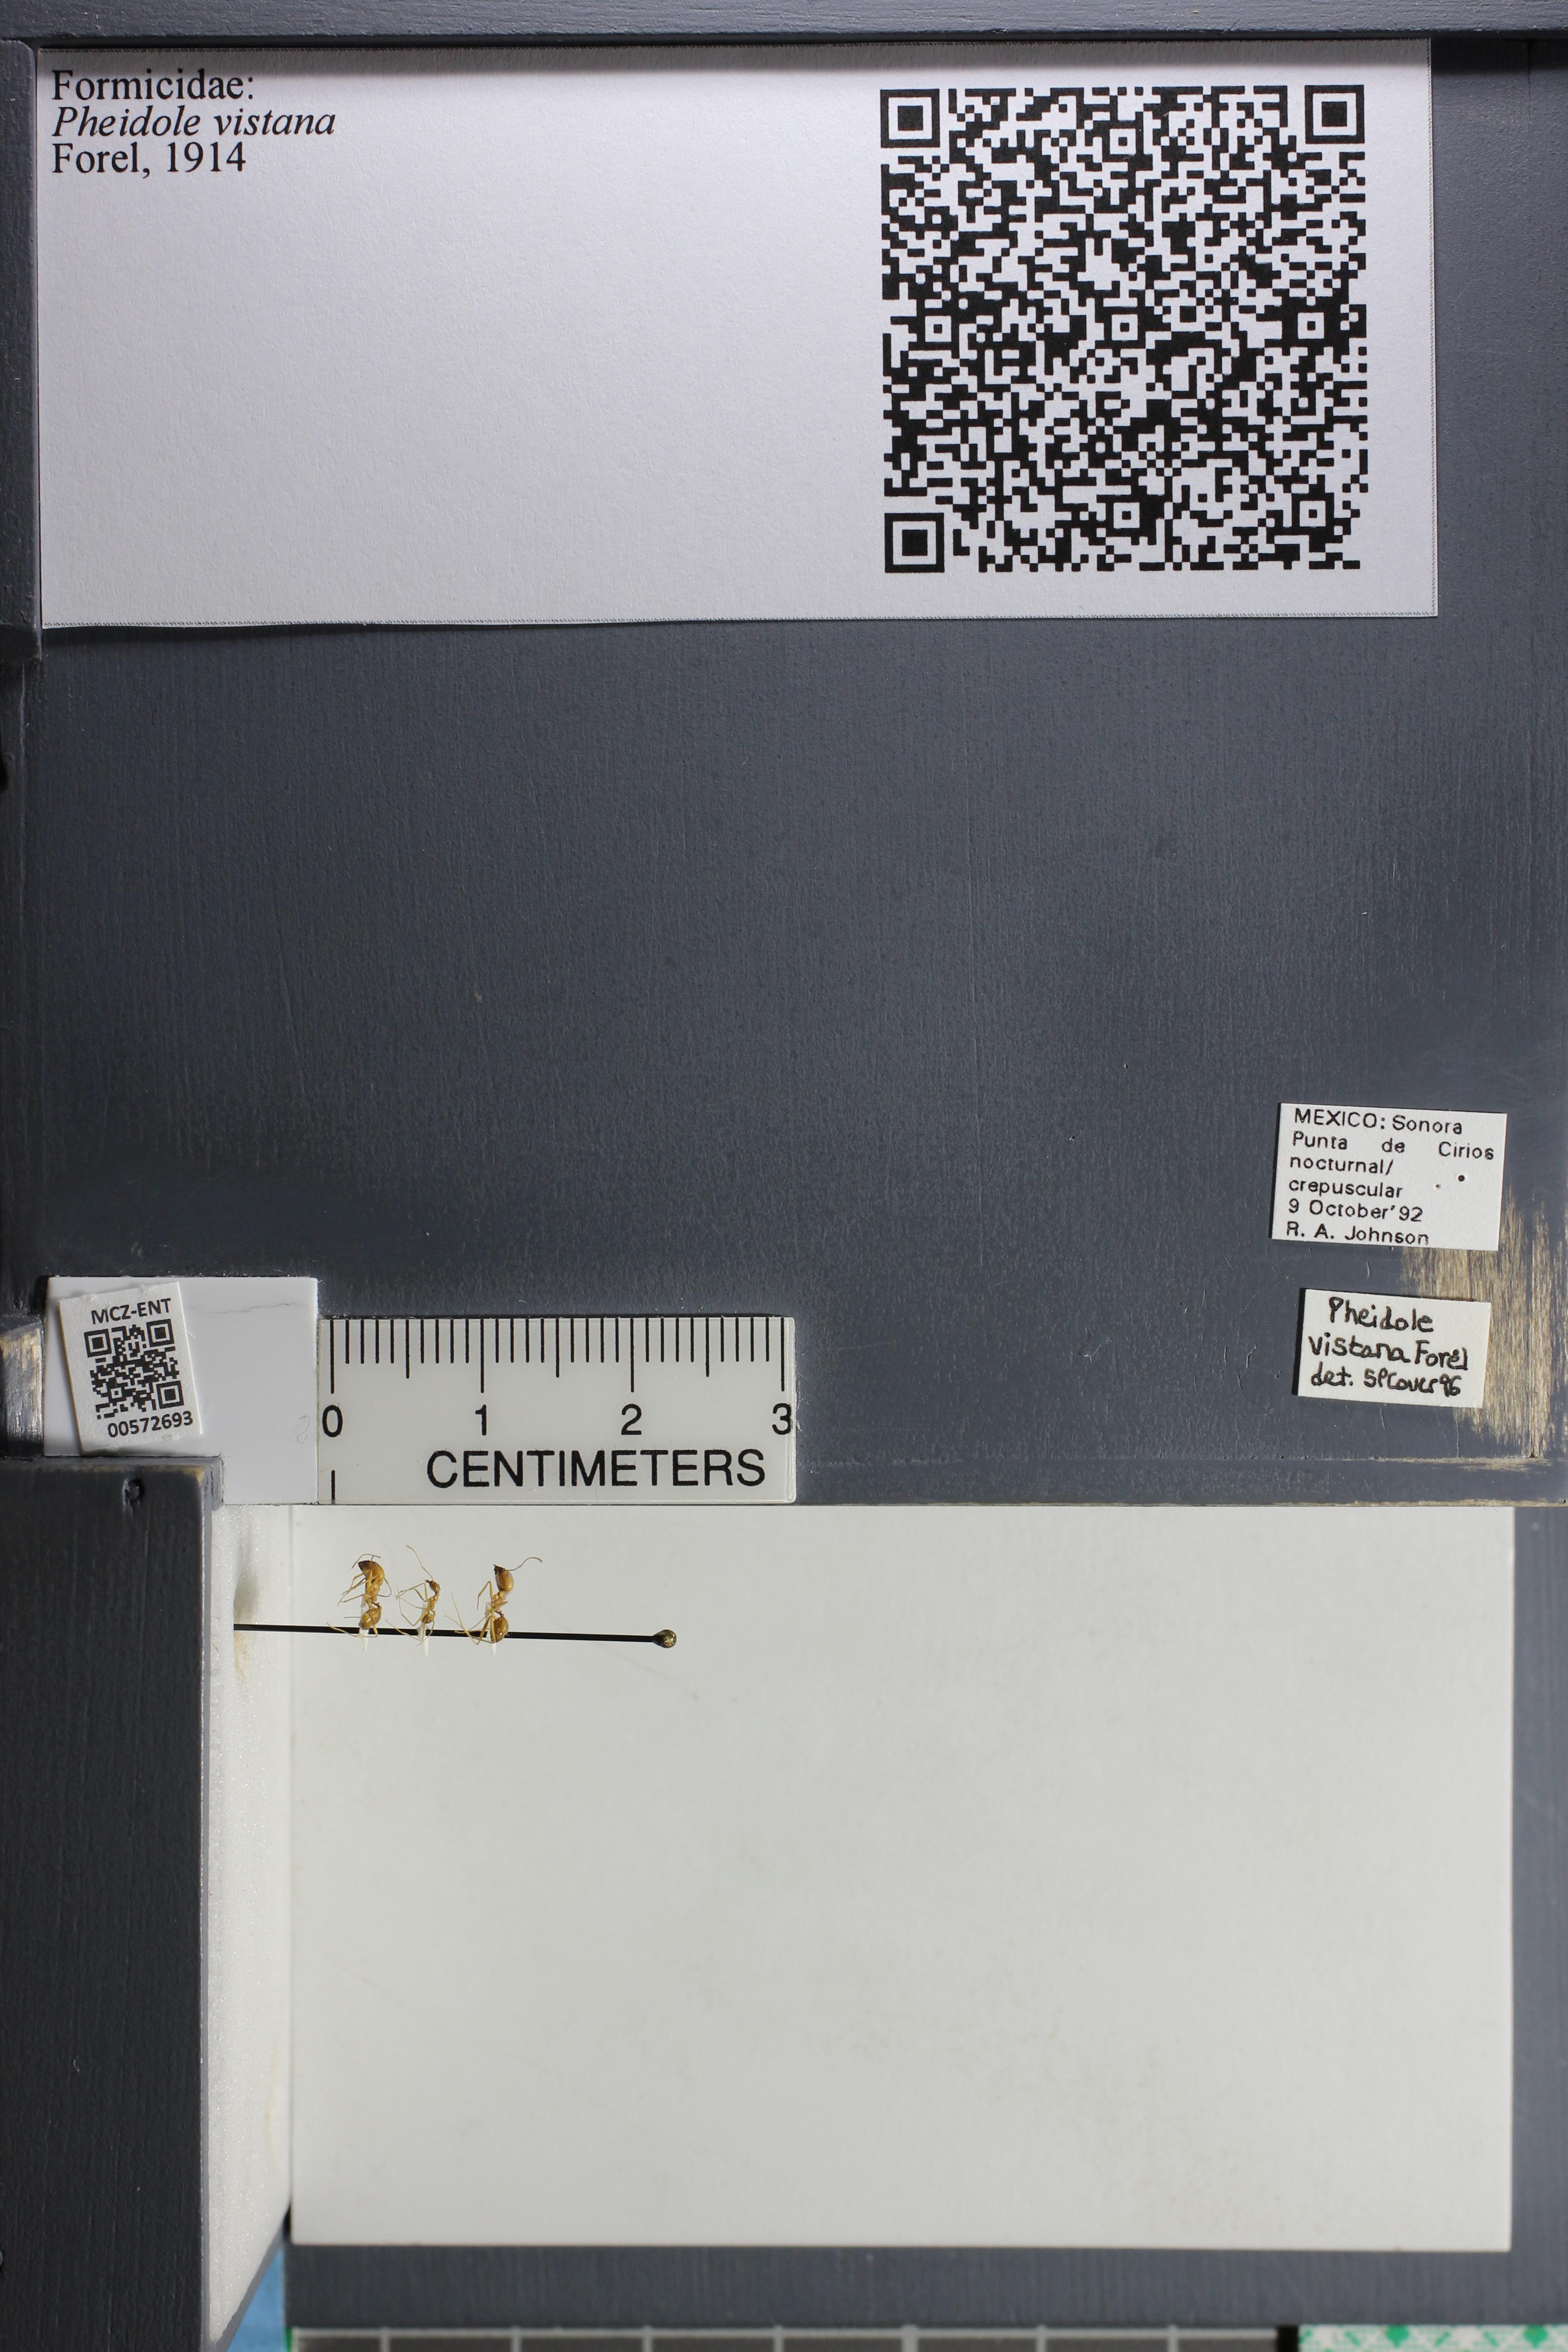 Media of type image, MCZ:Ent:572693 Identified as Pheidole vistana.